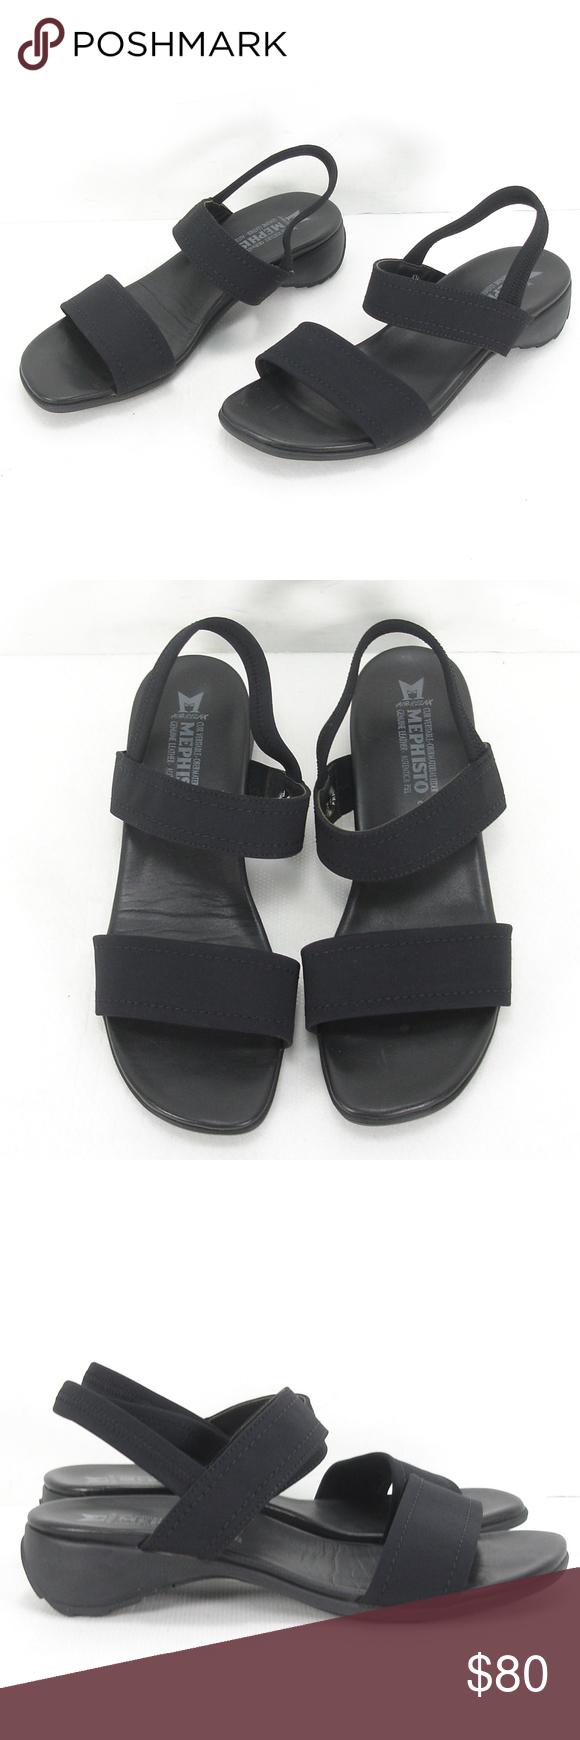 Mephisto air relax fabric slingbacks sandals 39